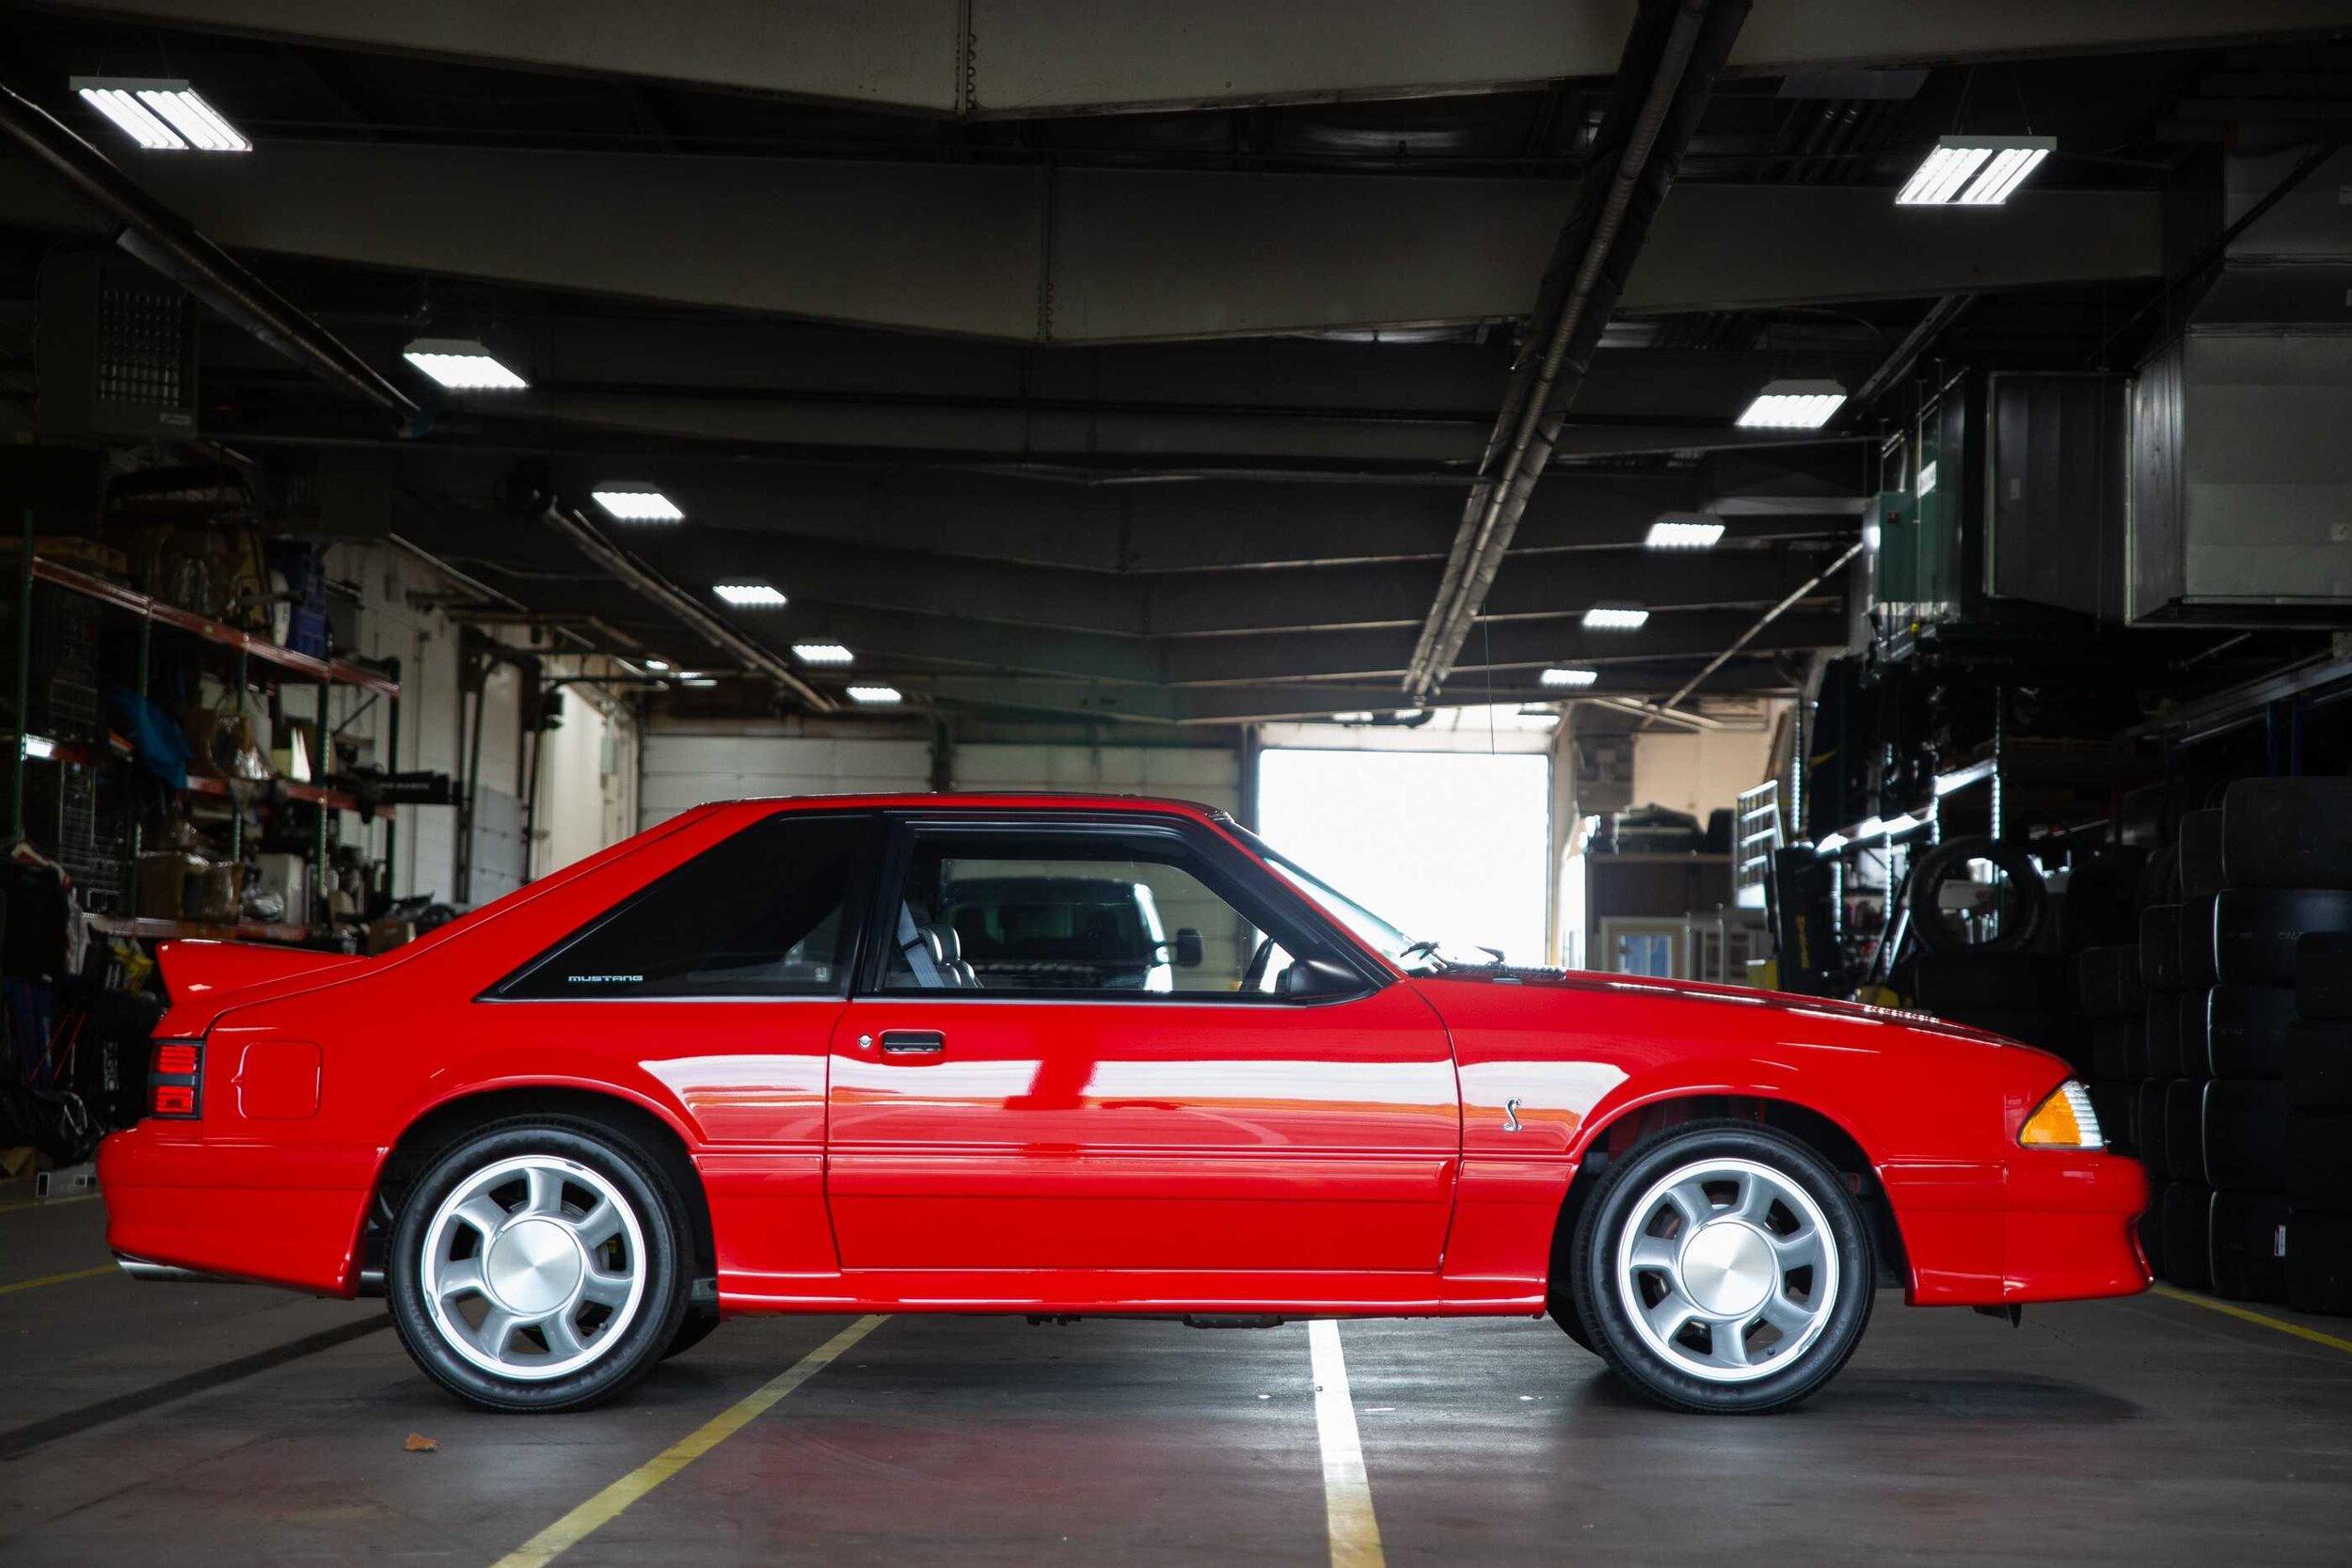 1993-ford-mustang-svt-cobra-vicci-140477.jpg